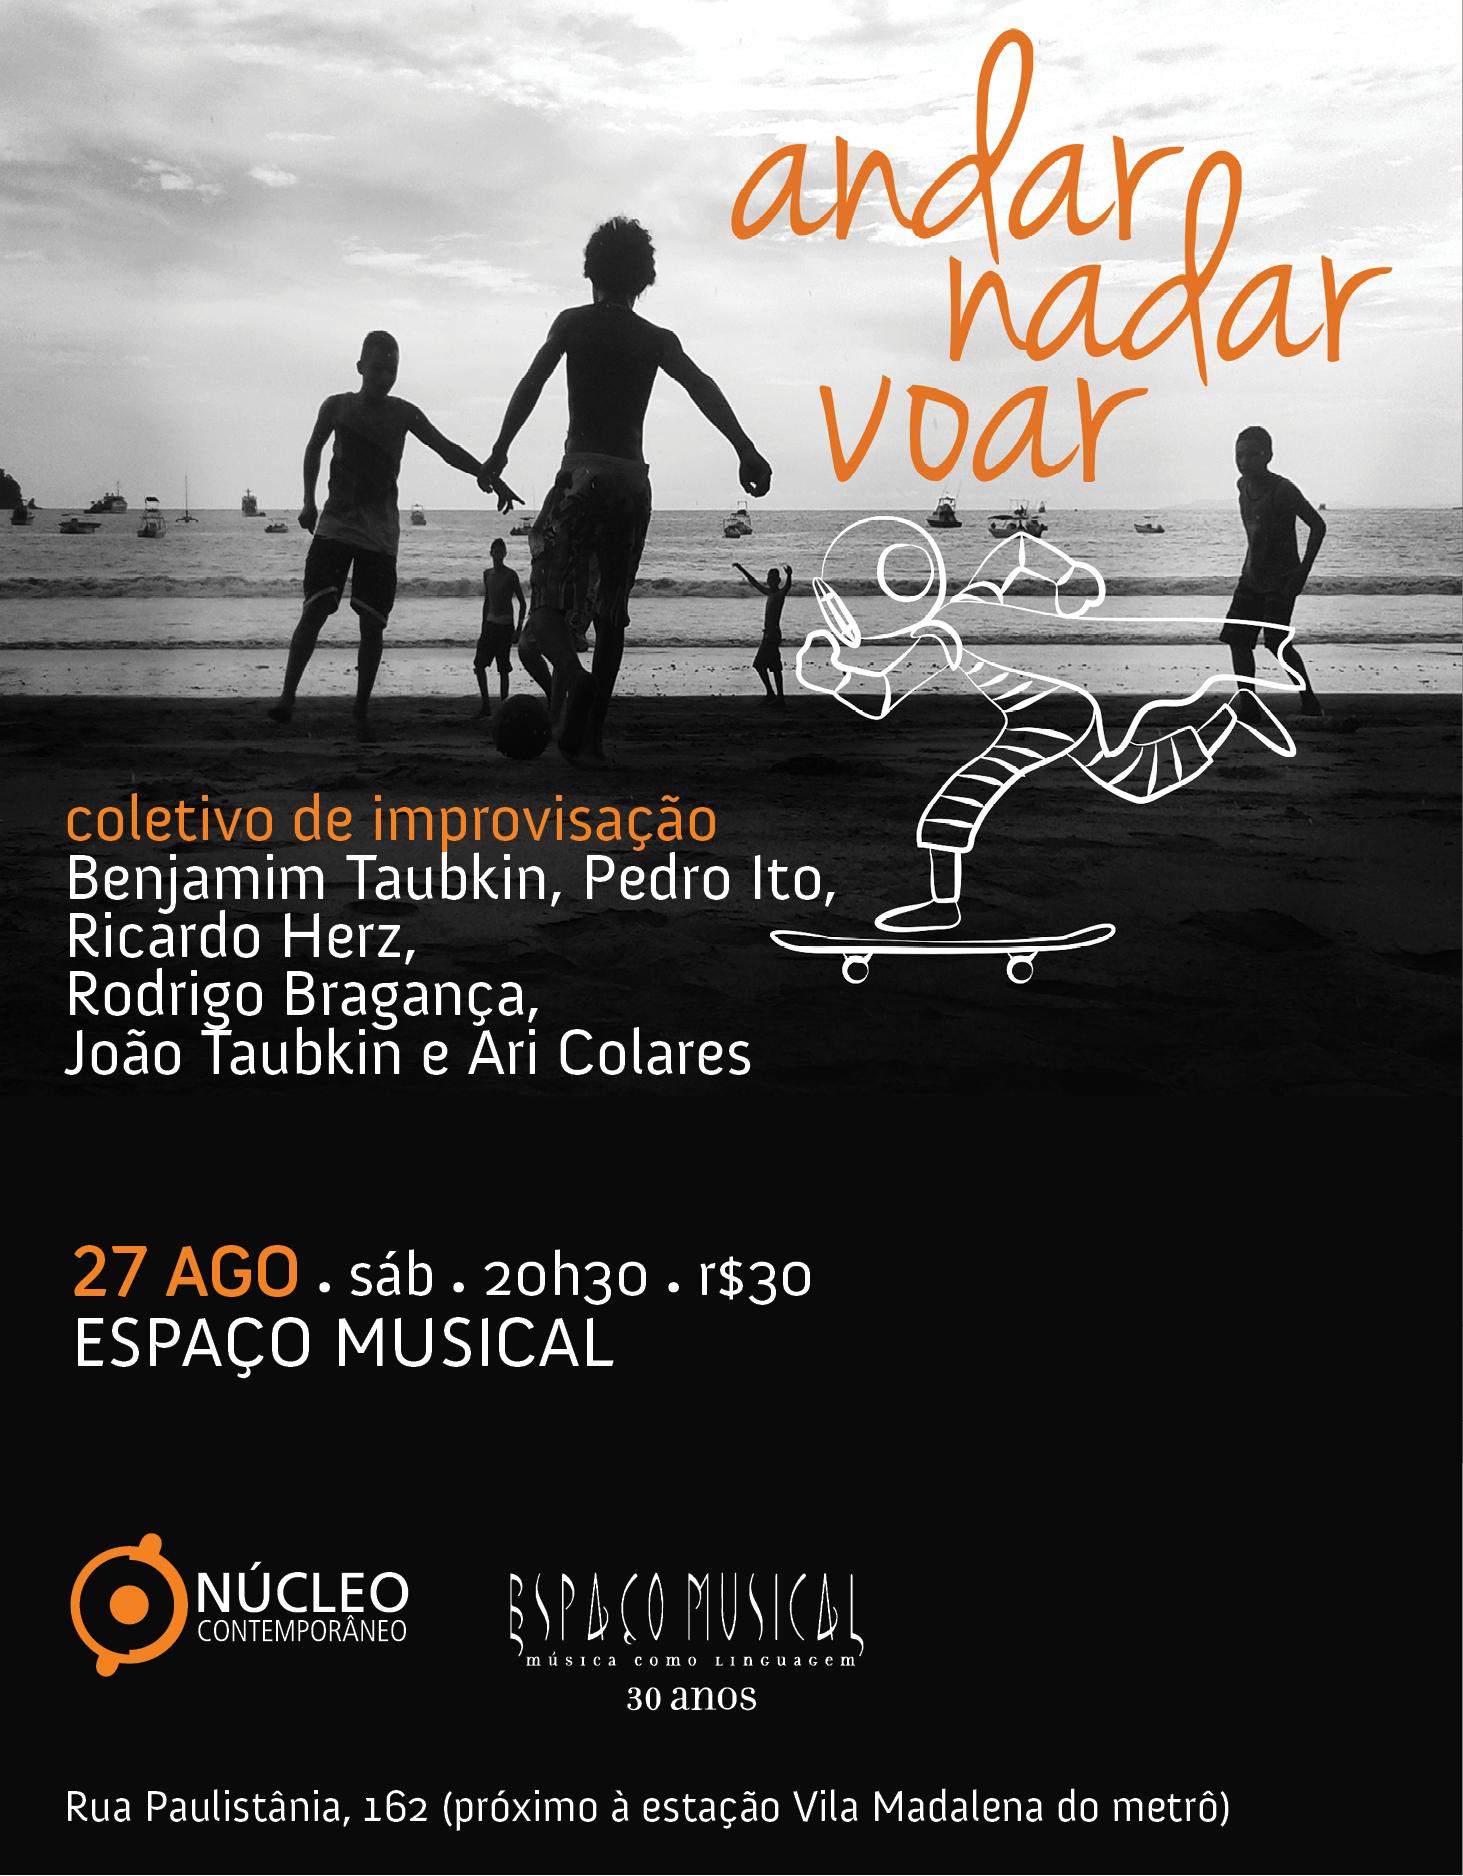 andarnadarvoar_espaco_musical_AGO